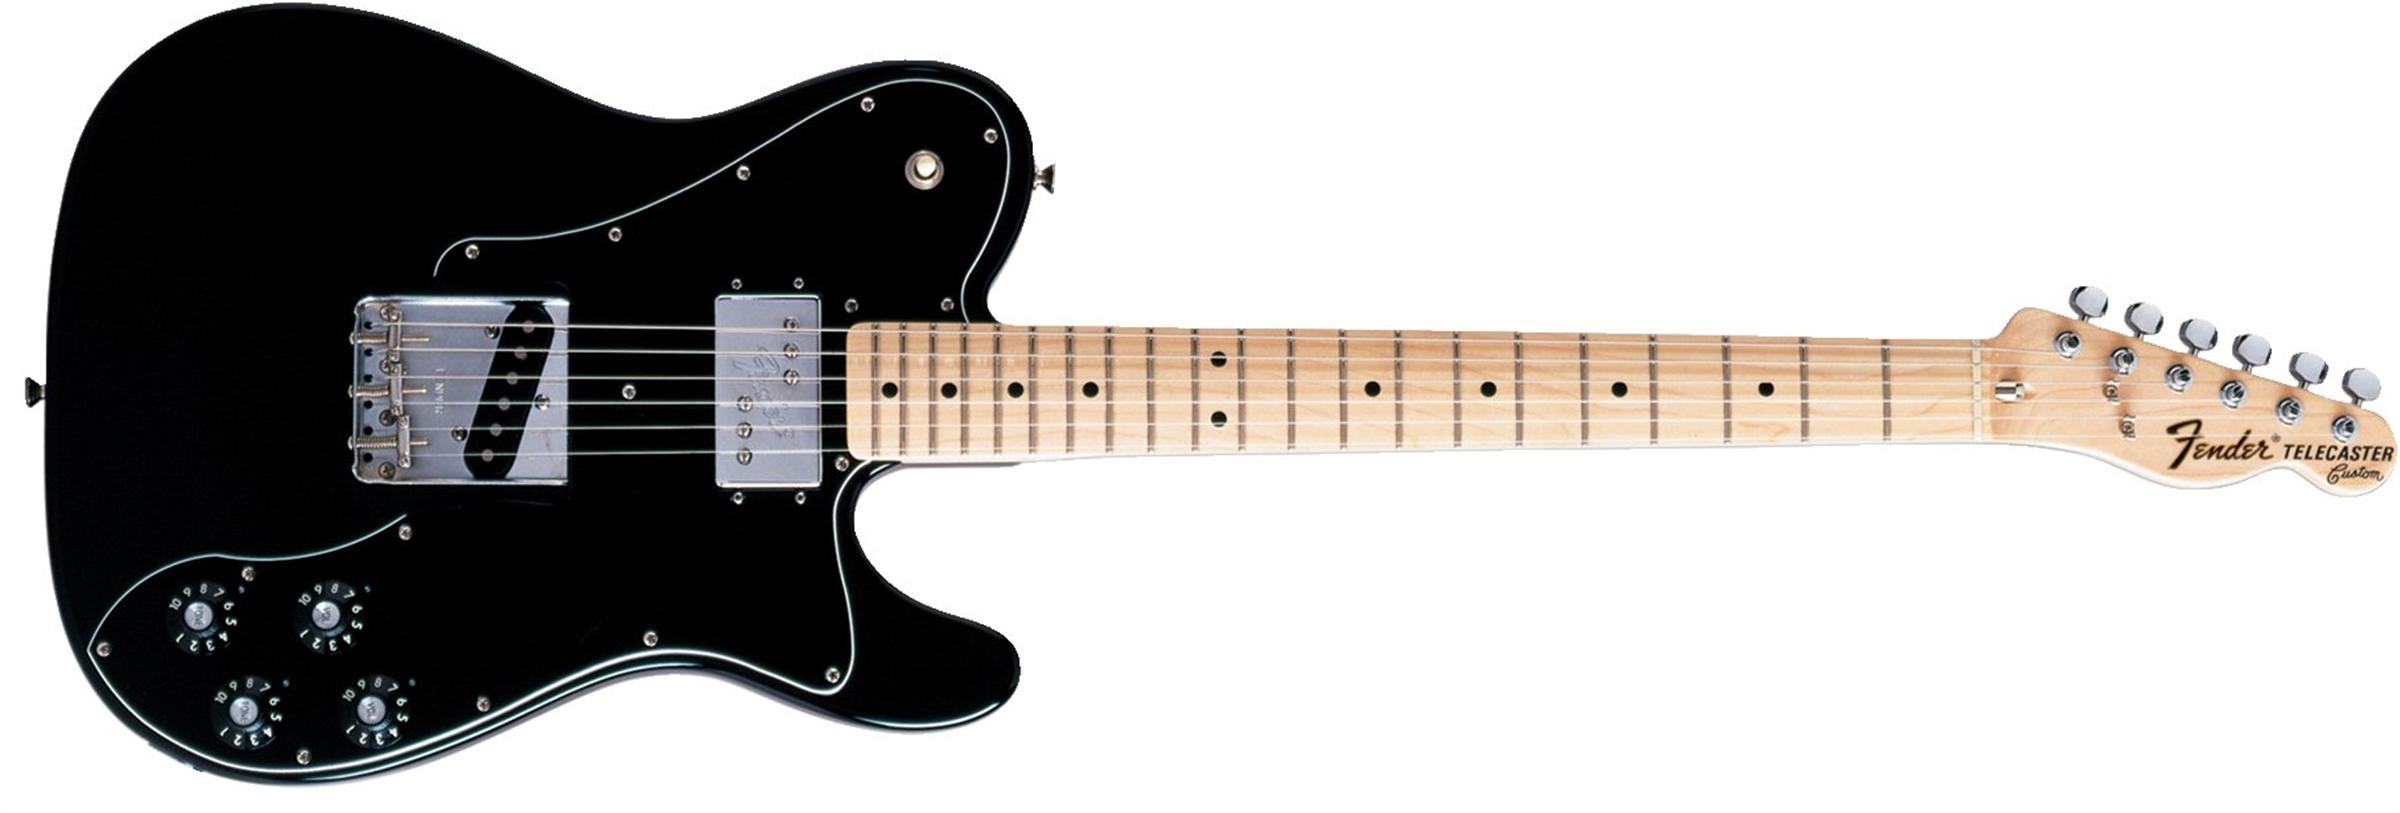 Fender Classic Series 72 Telecaster 174 Custom Maple